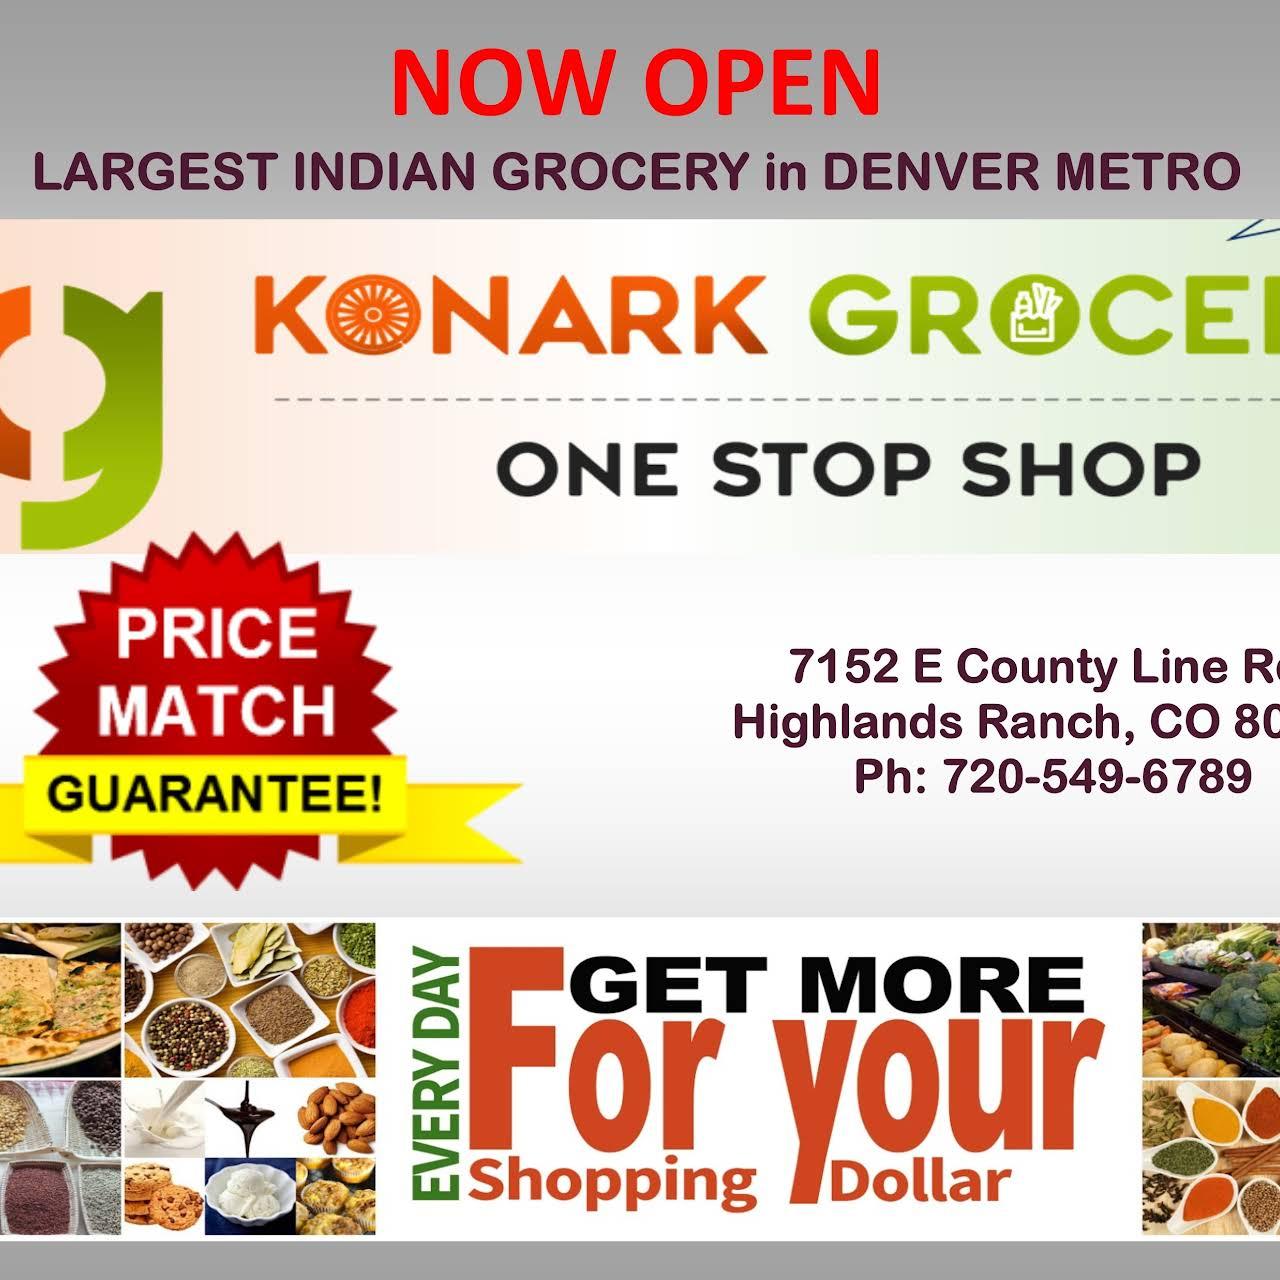 Konark Grocers - Indian Grocery Store in Highlands Ranch